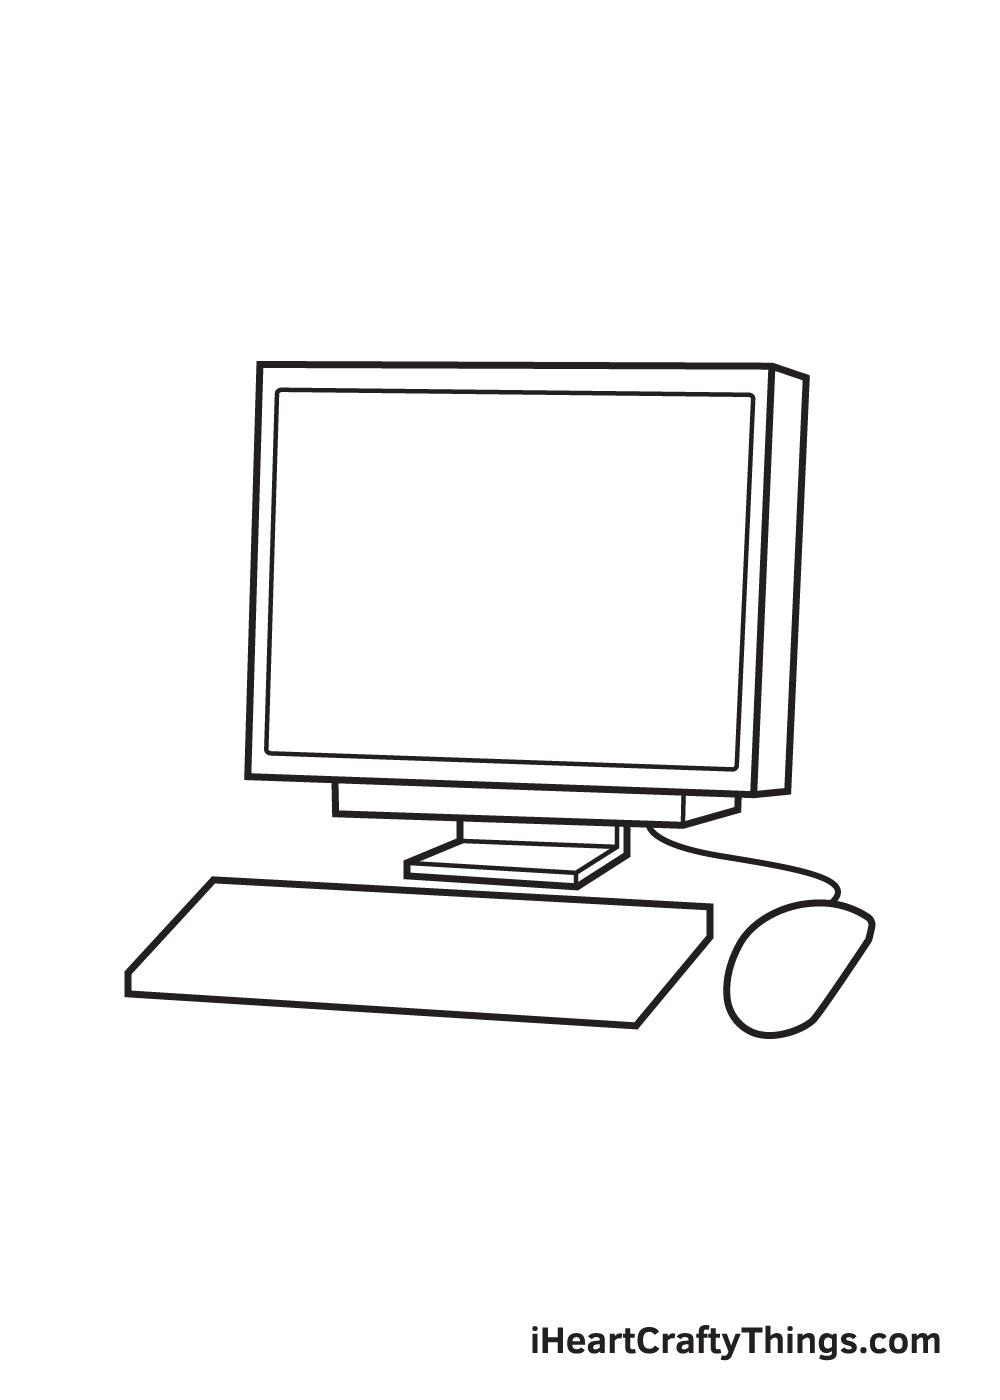 computer drawing - step 5